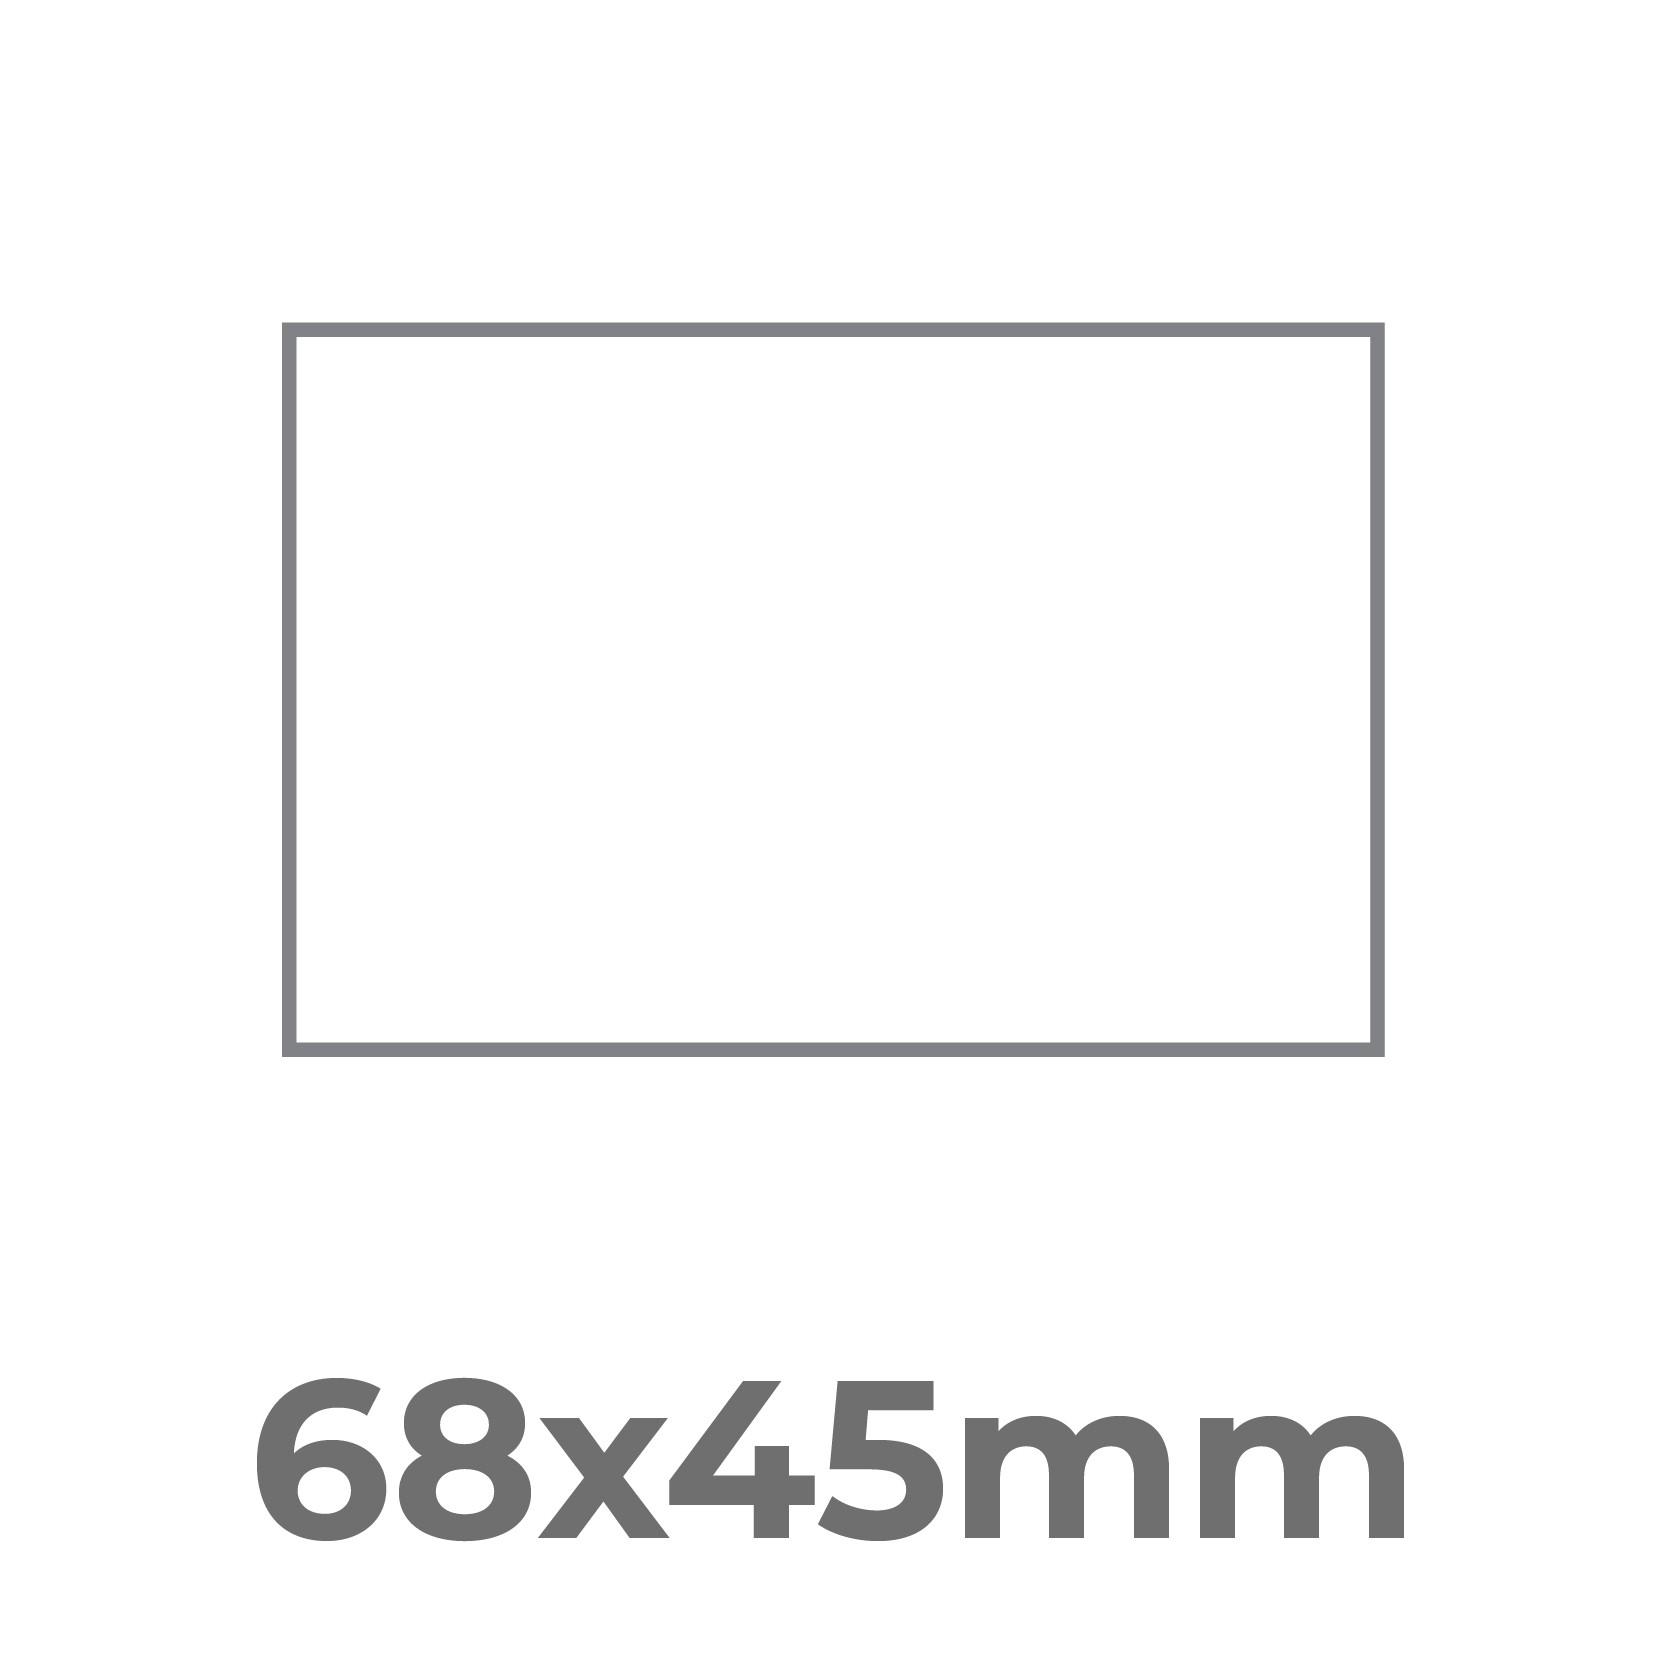 68x45 mm.